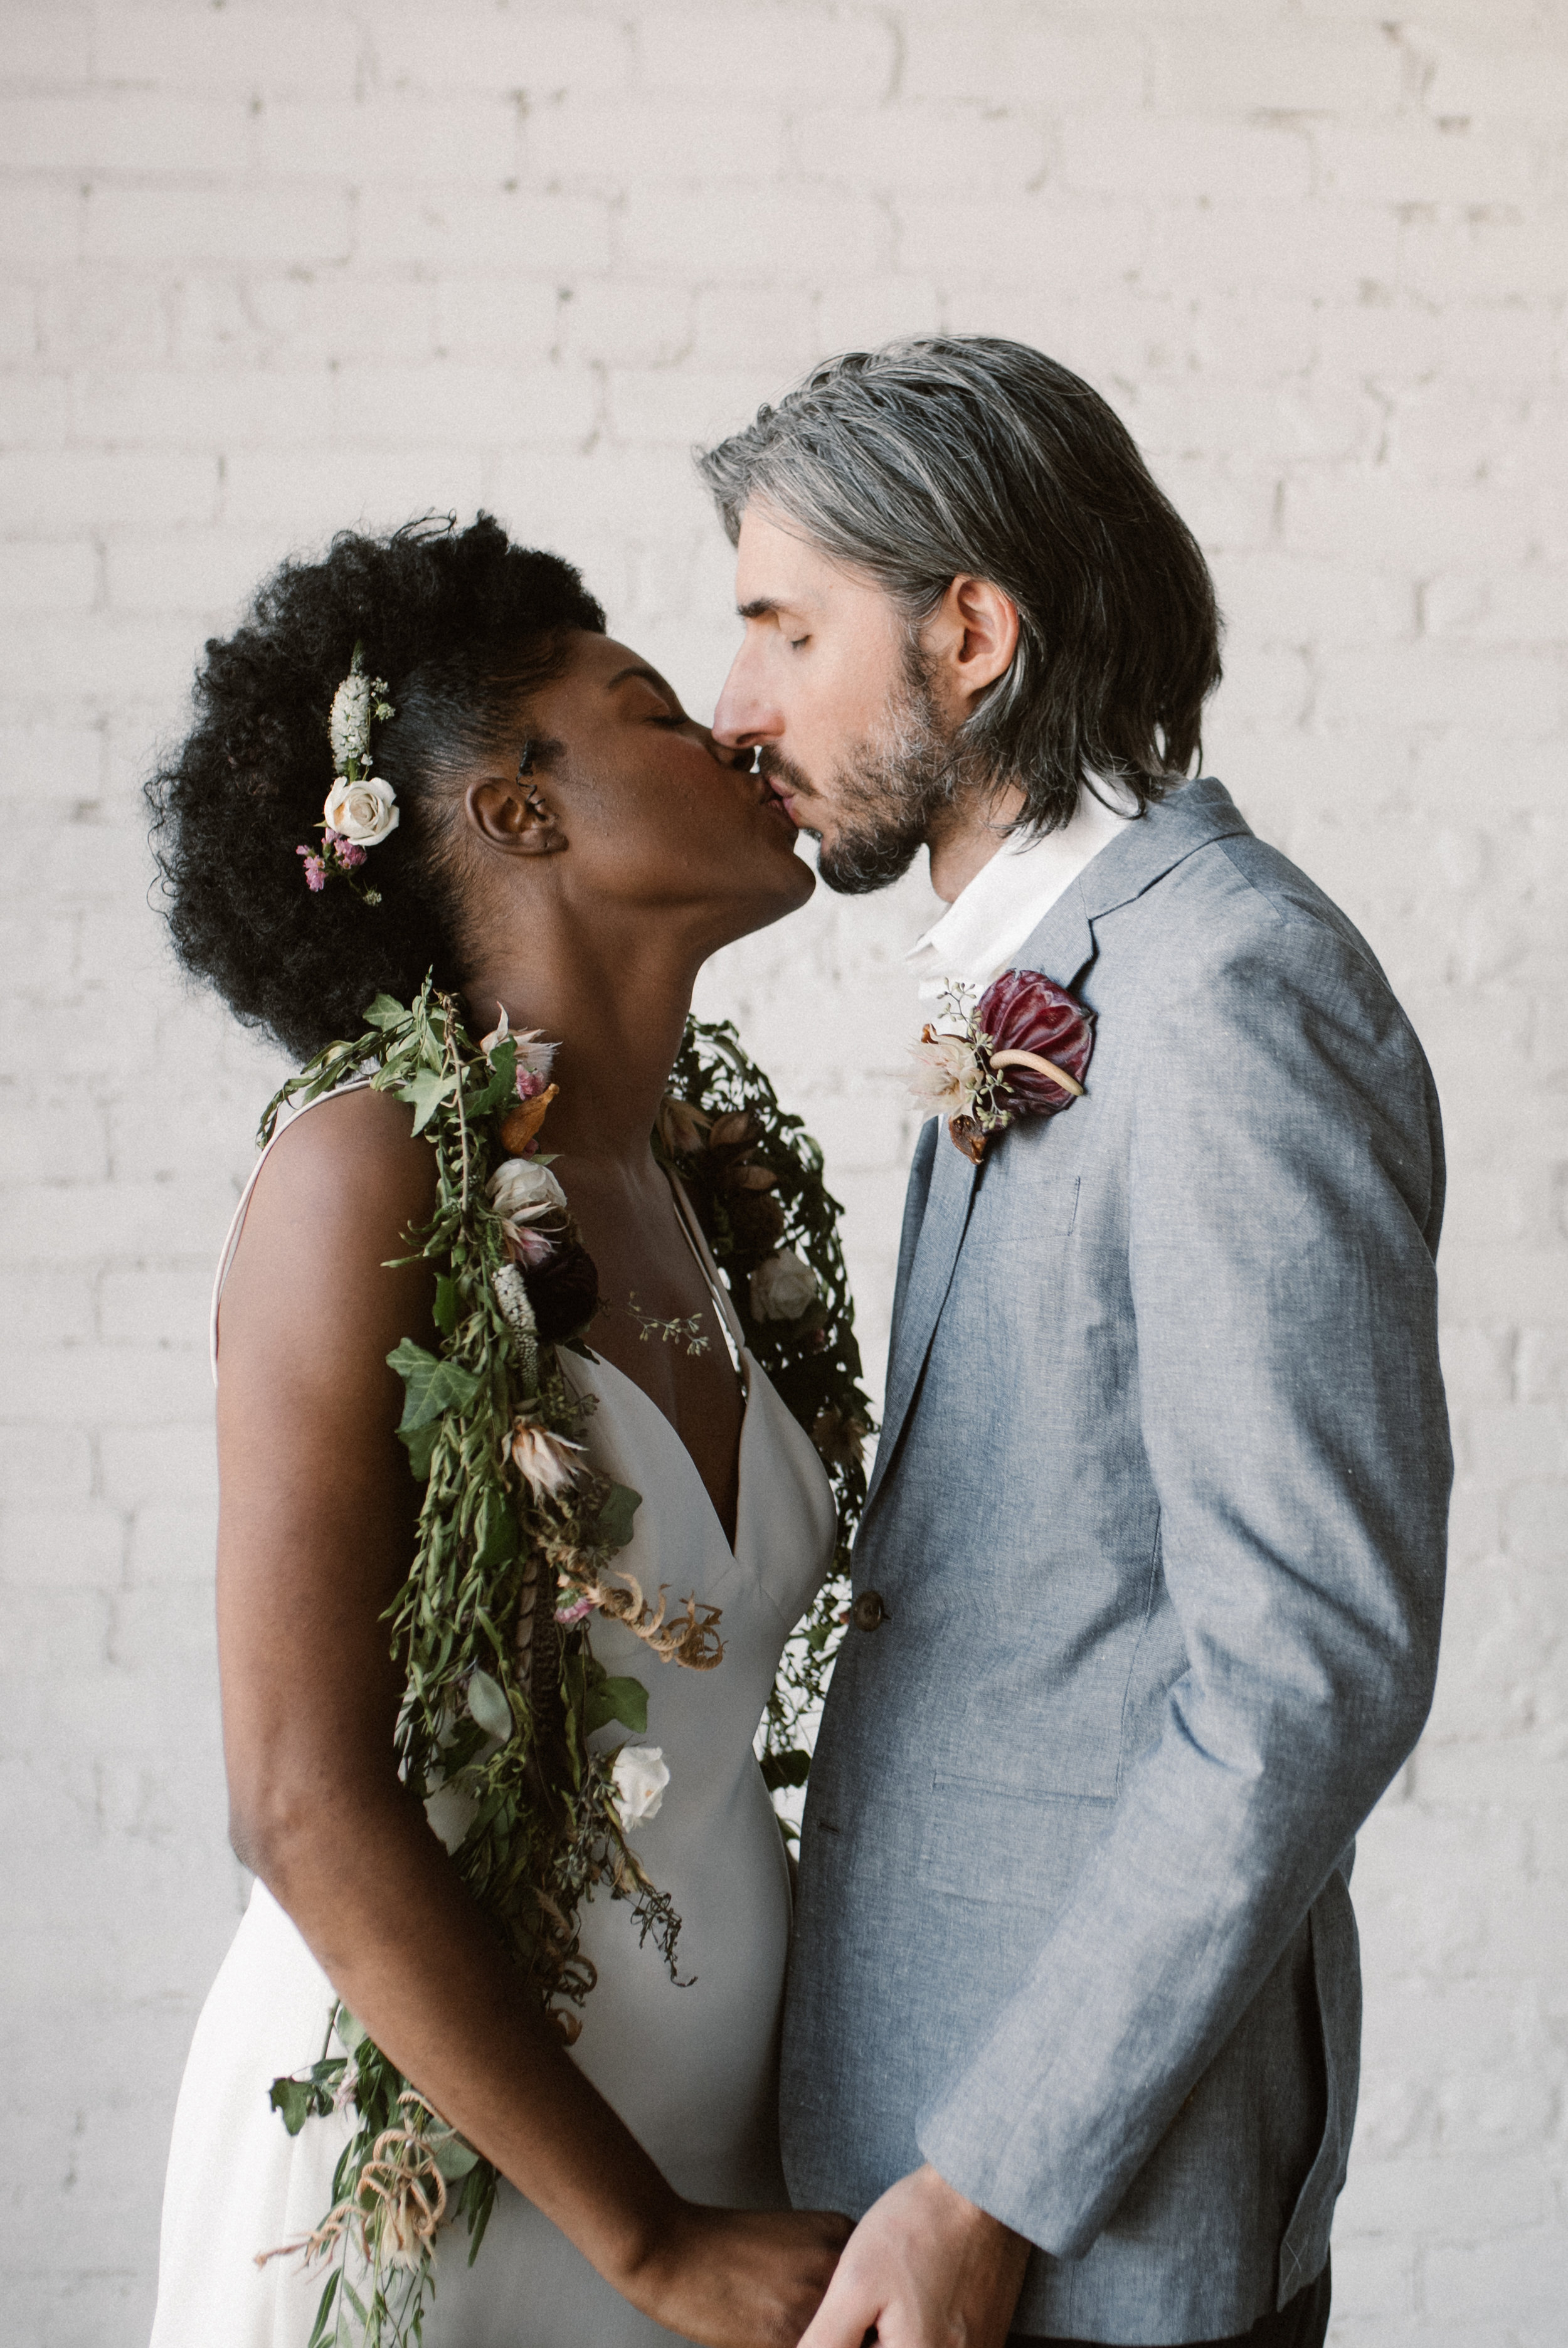 haus-820-minimal-editorial-wedding-styled-shoot-56.jpg